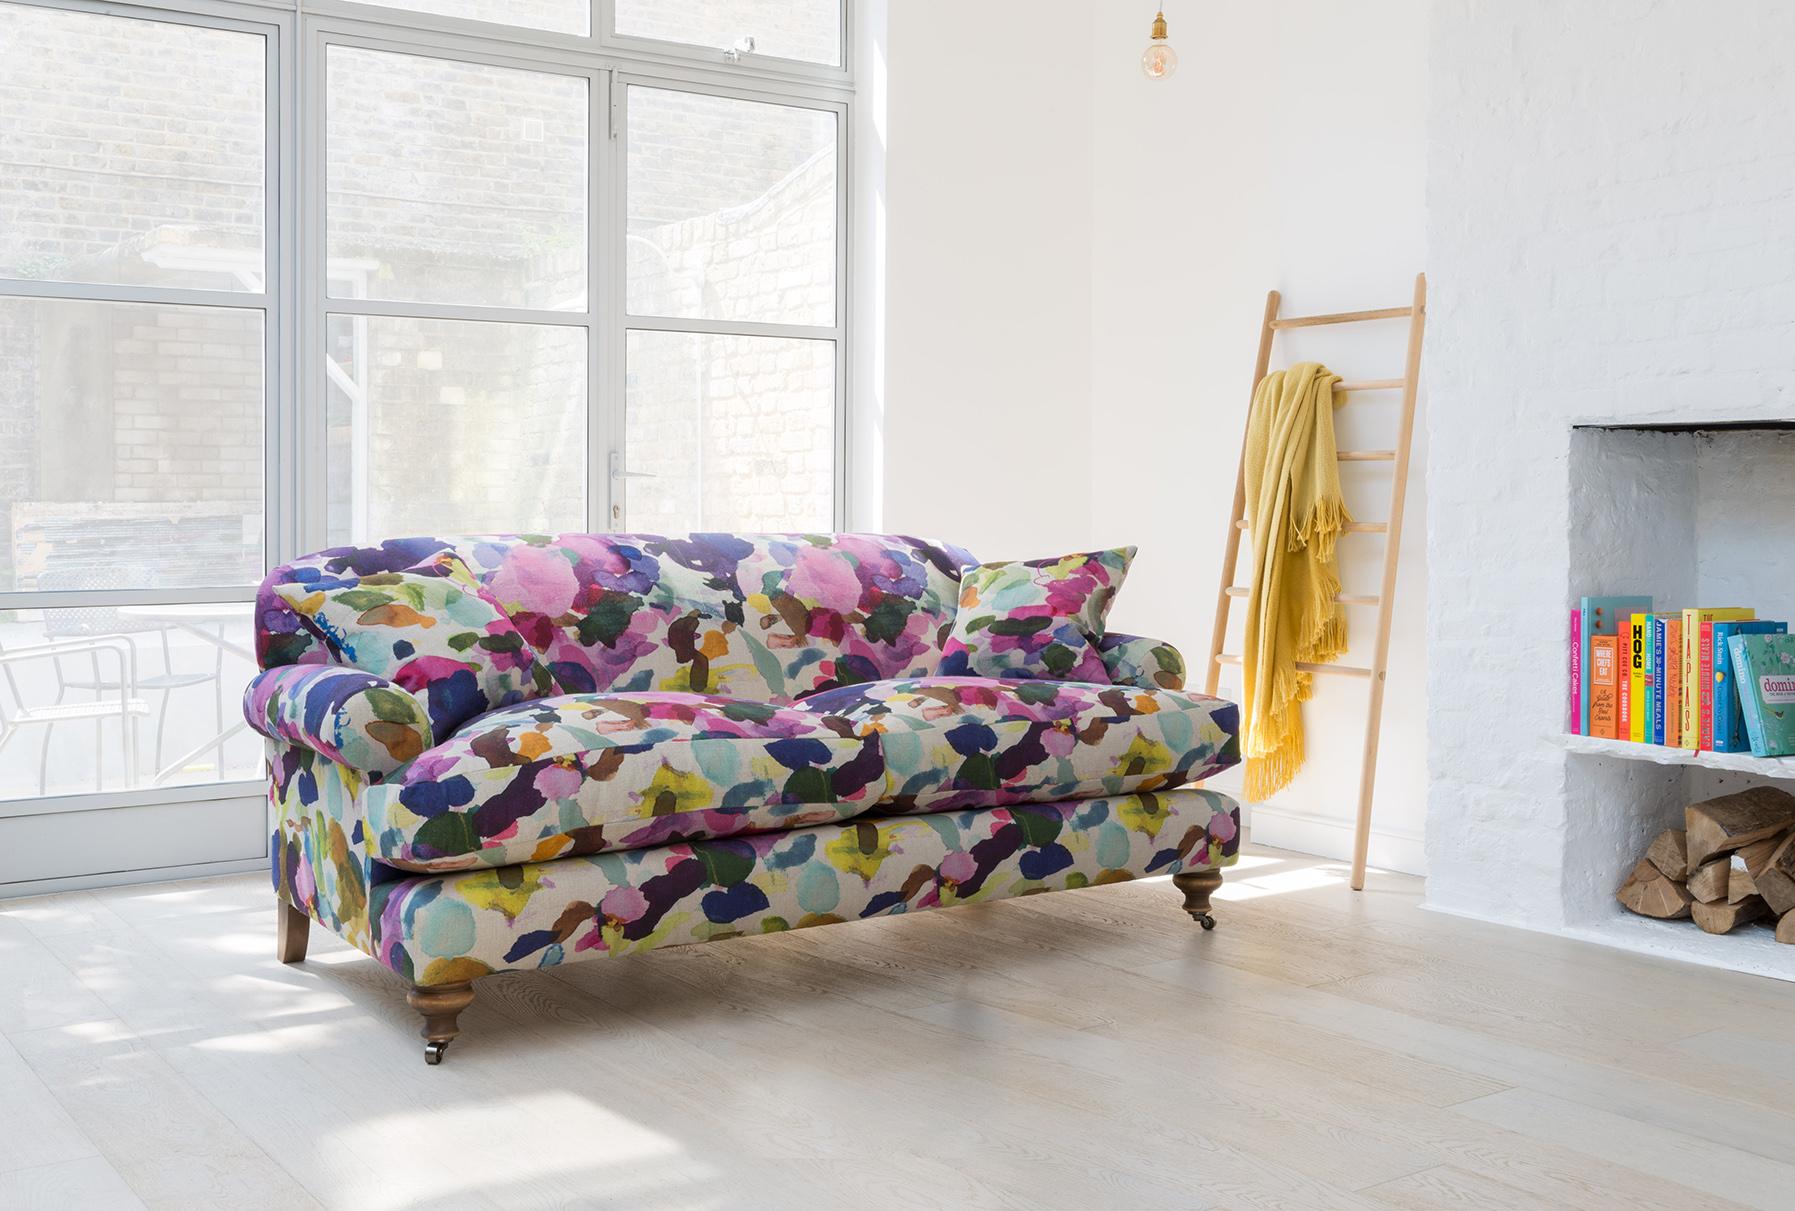 Hampton large sofa in bluebellgray's James fabric, from Sofas & Stuff